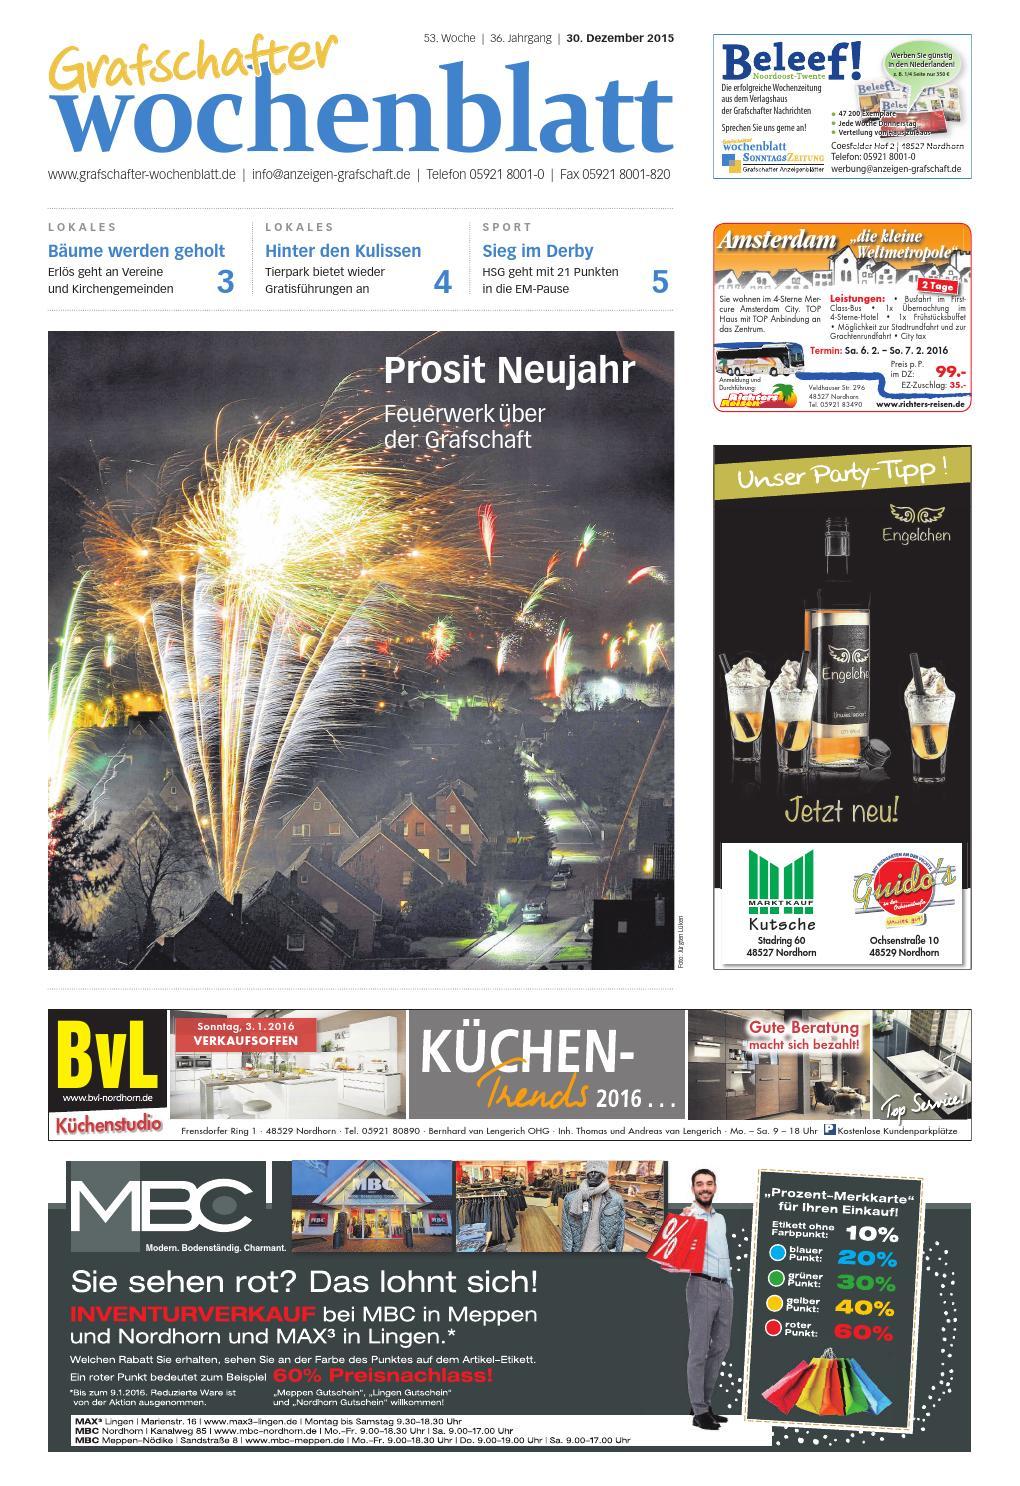 Grafschafter Wochenblatt_30.12.2015 by SonntagsZeitung - issuu